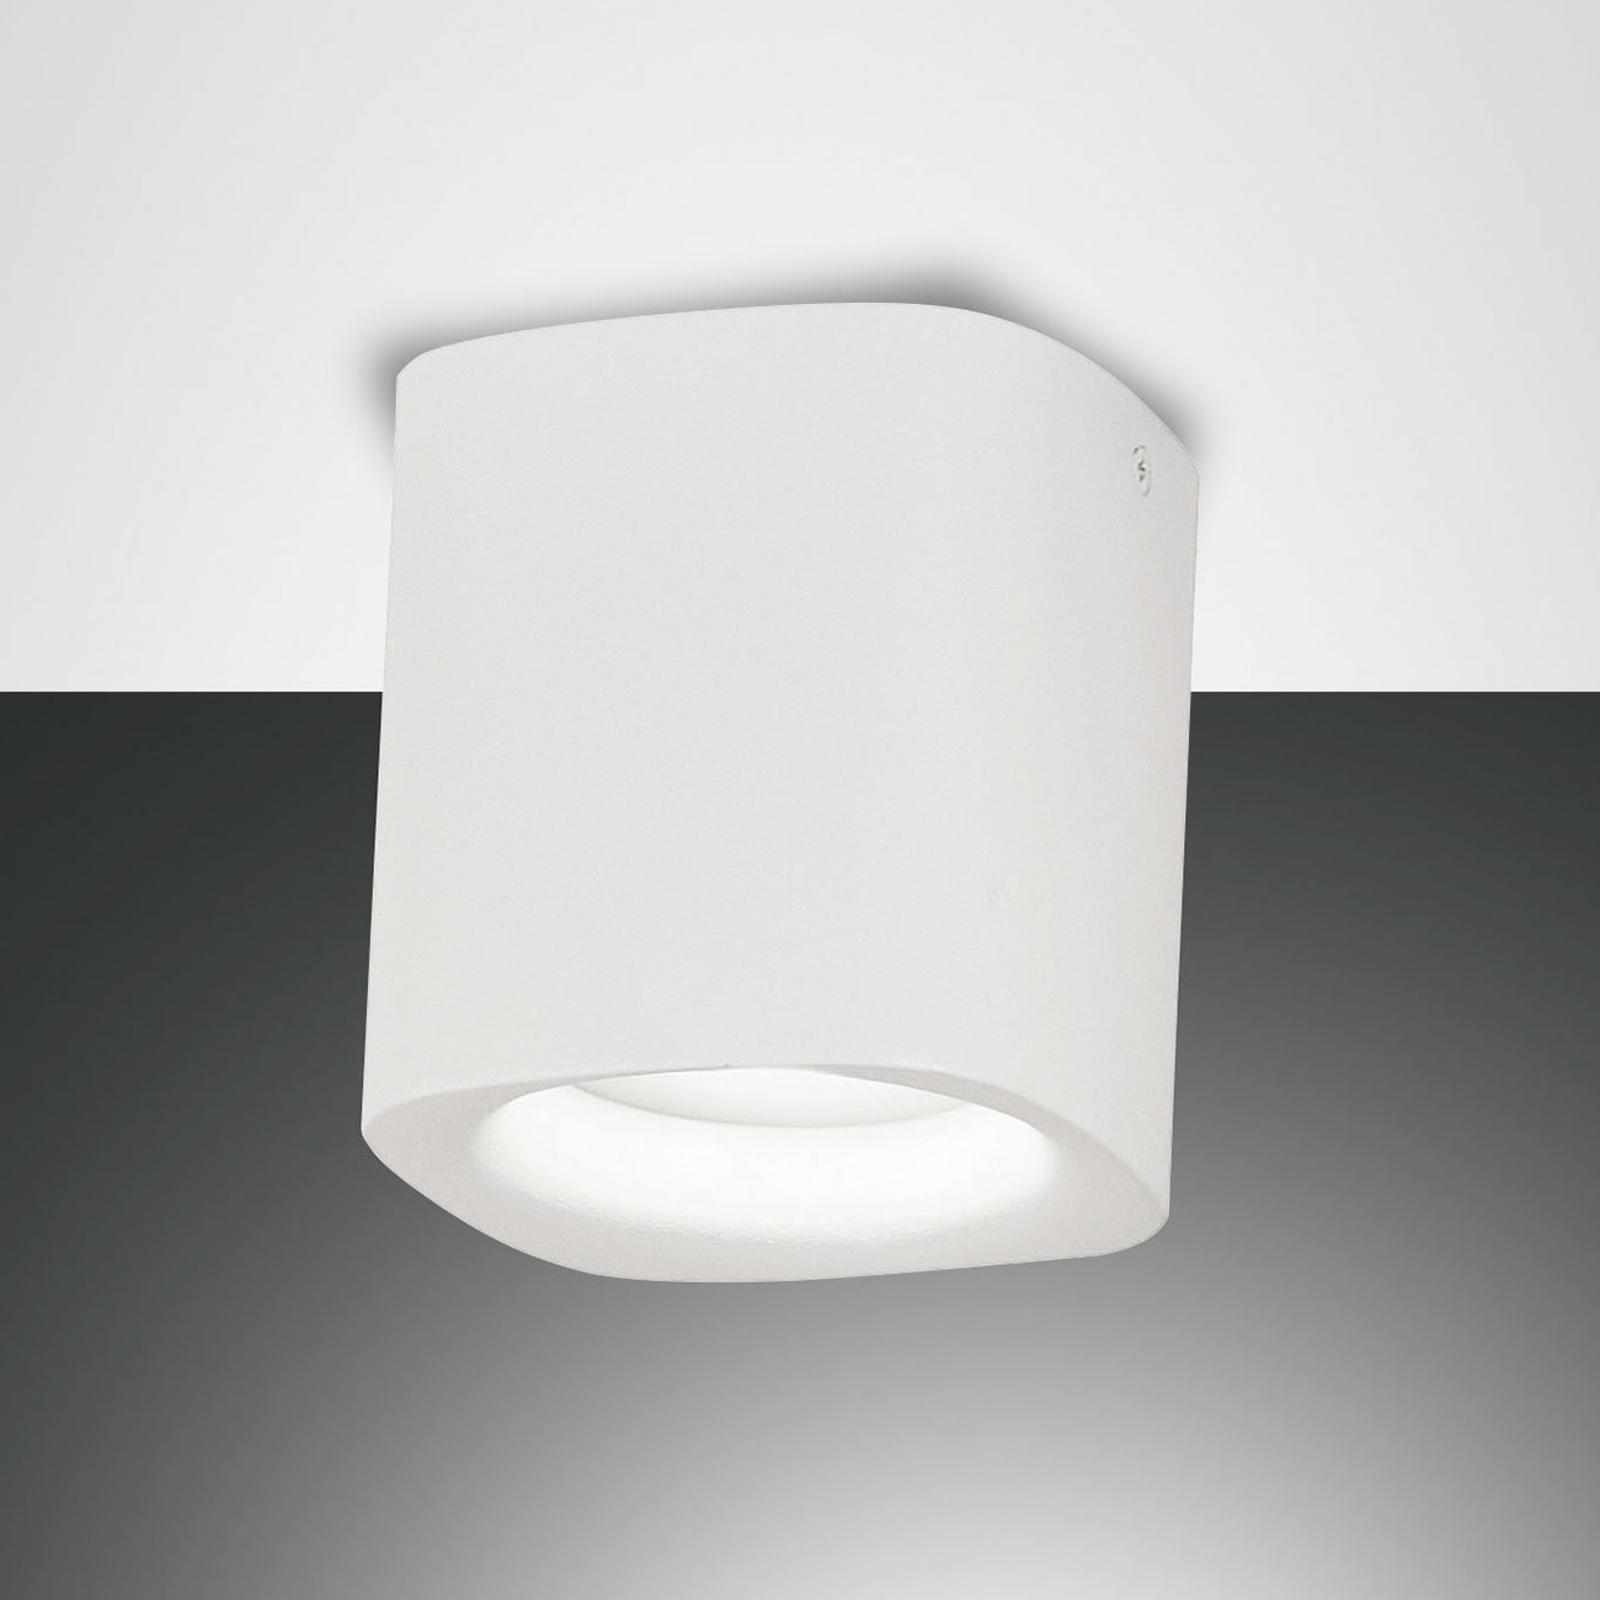 Lampa sufitowa Smooth, 1-punktowa, biała, IP44